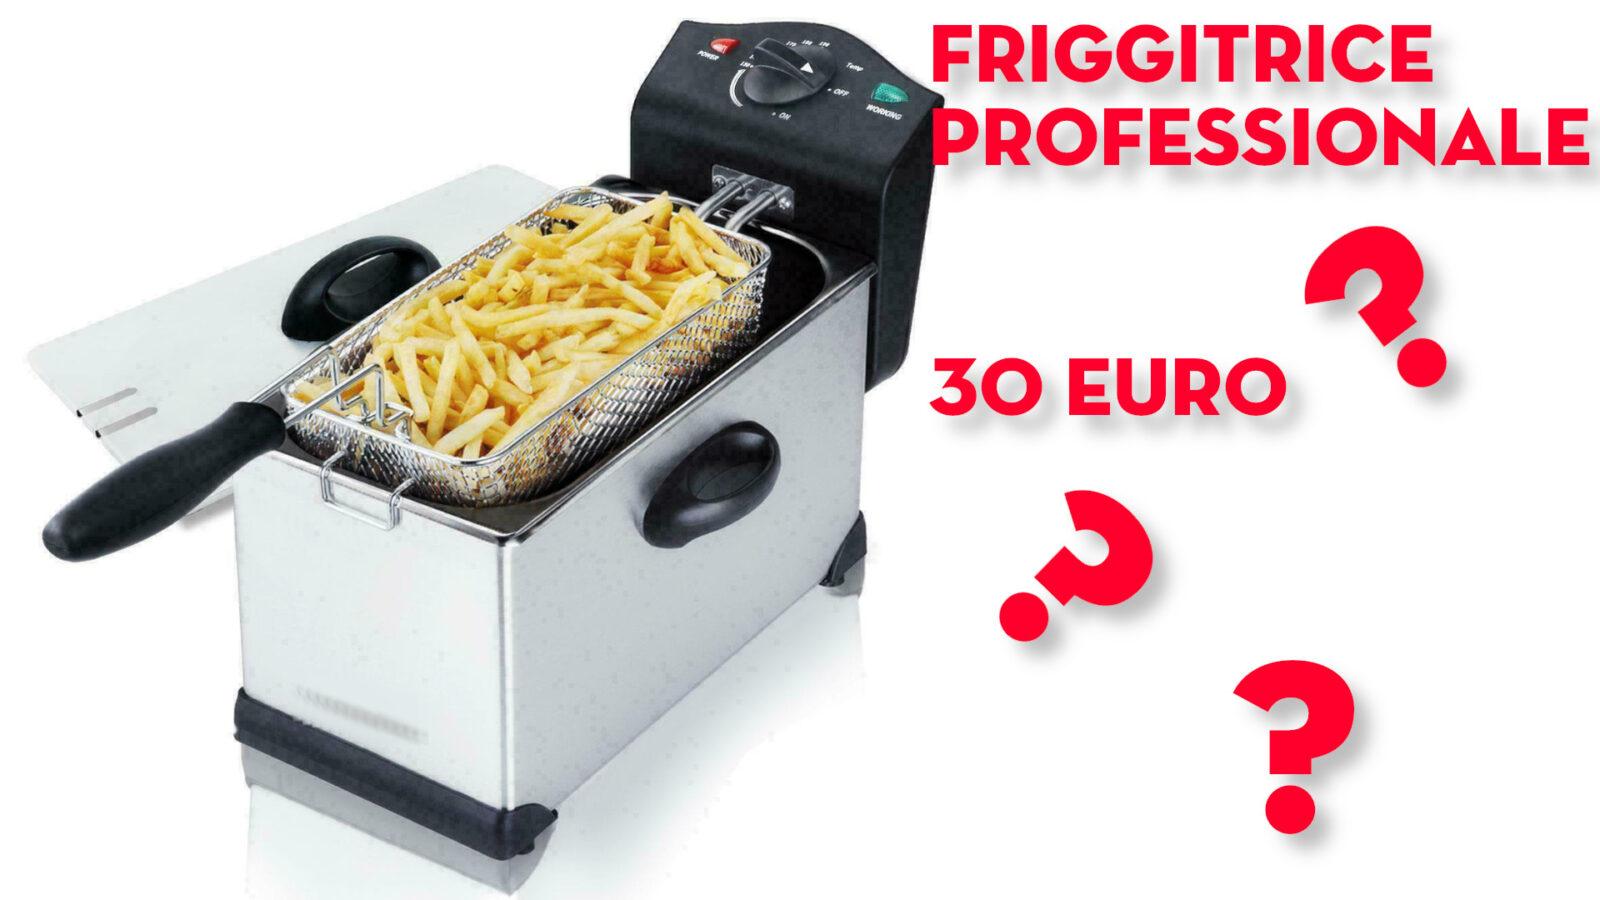 friggitrice professionale economica